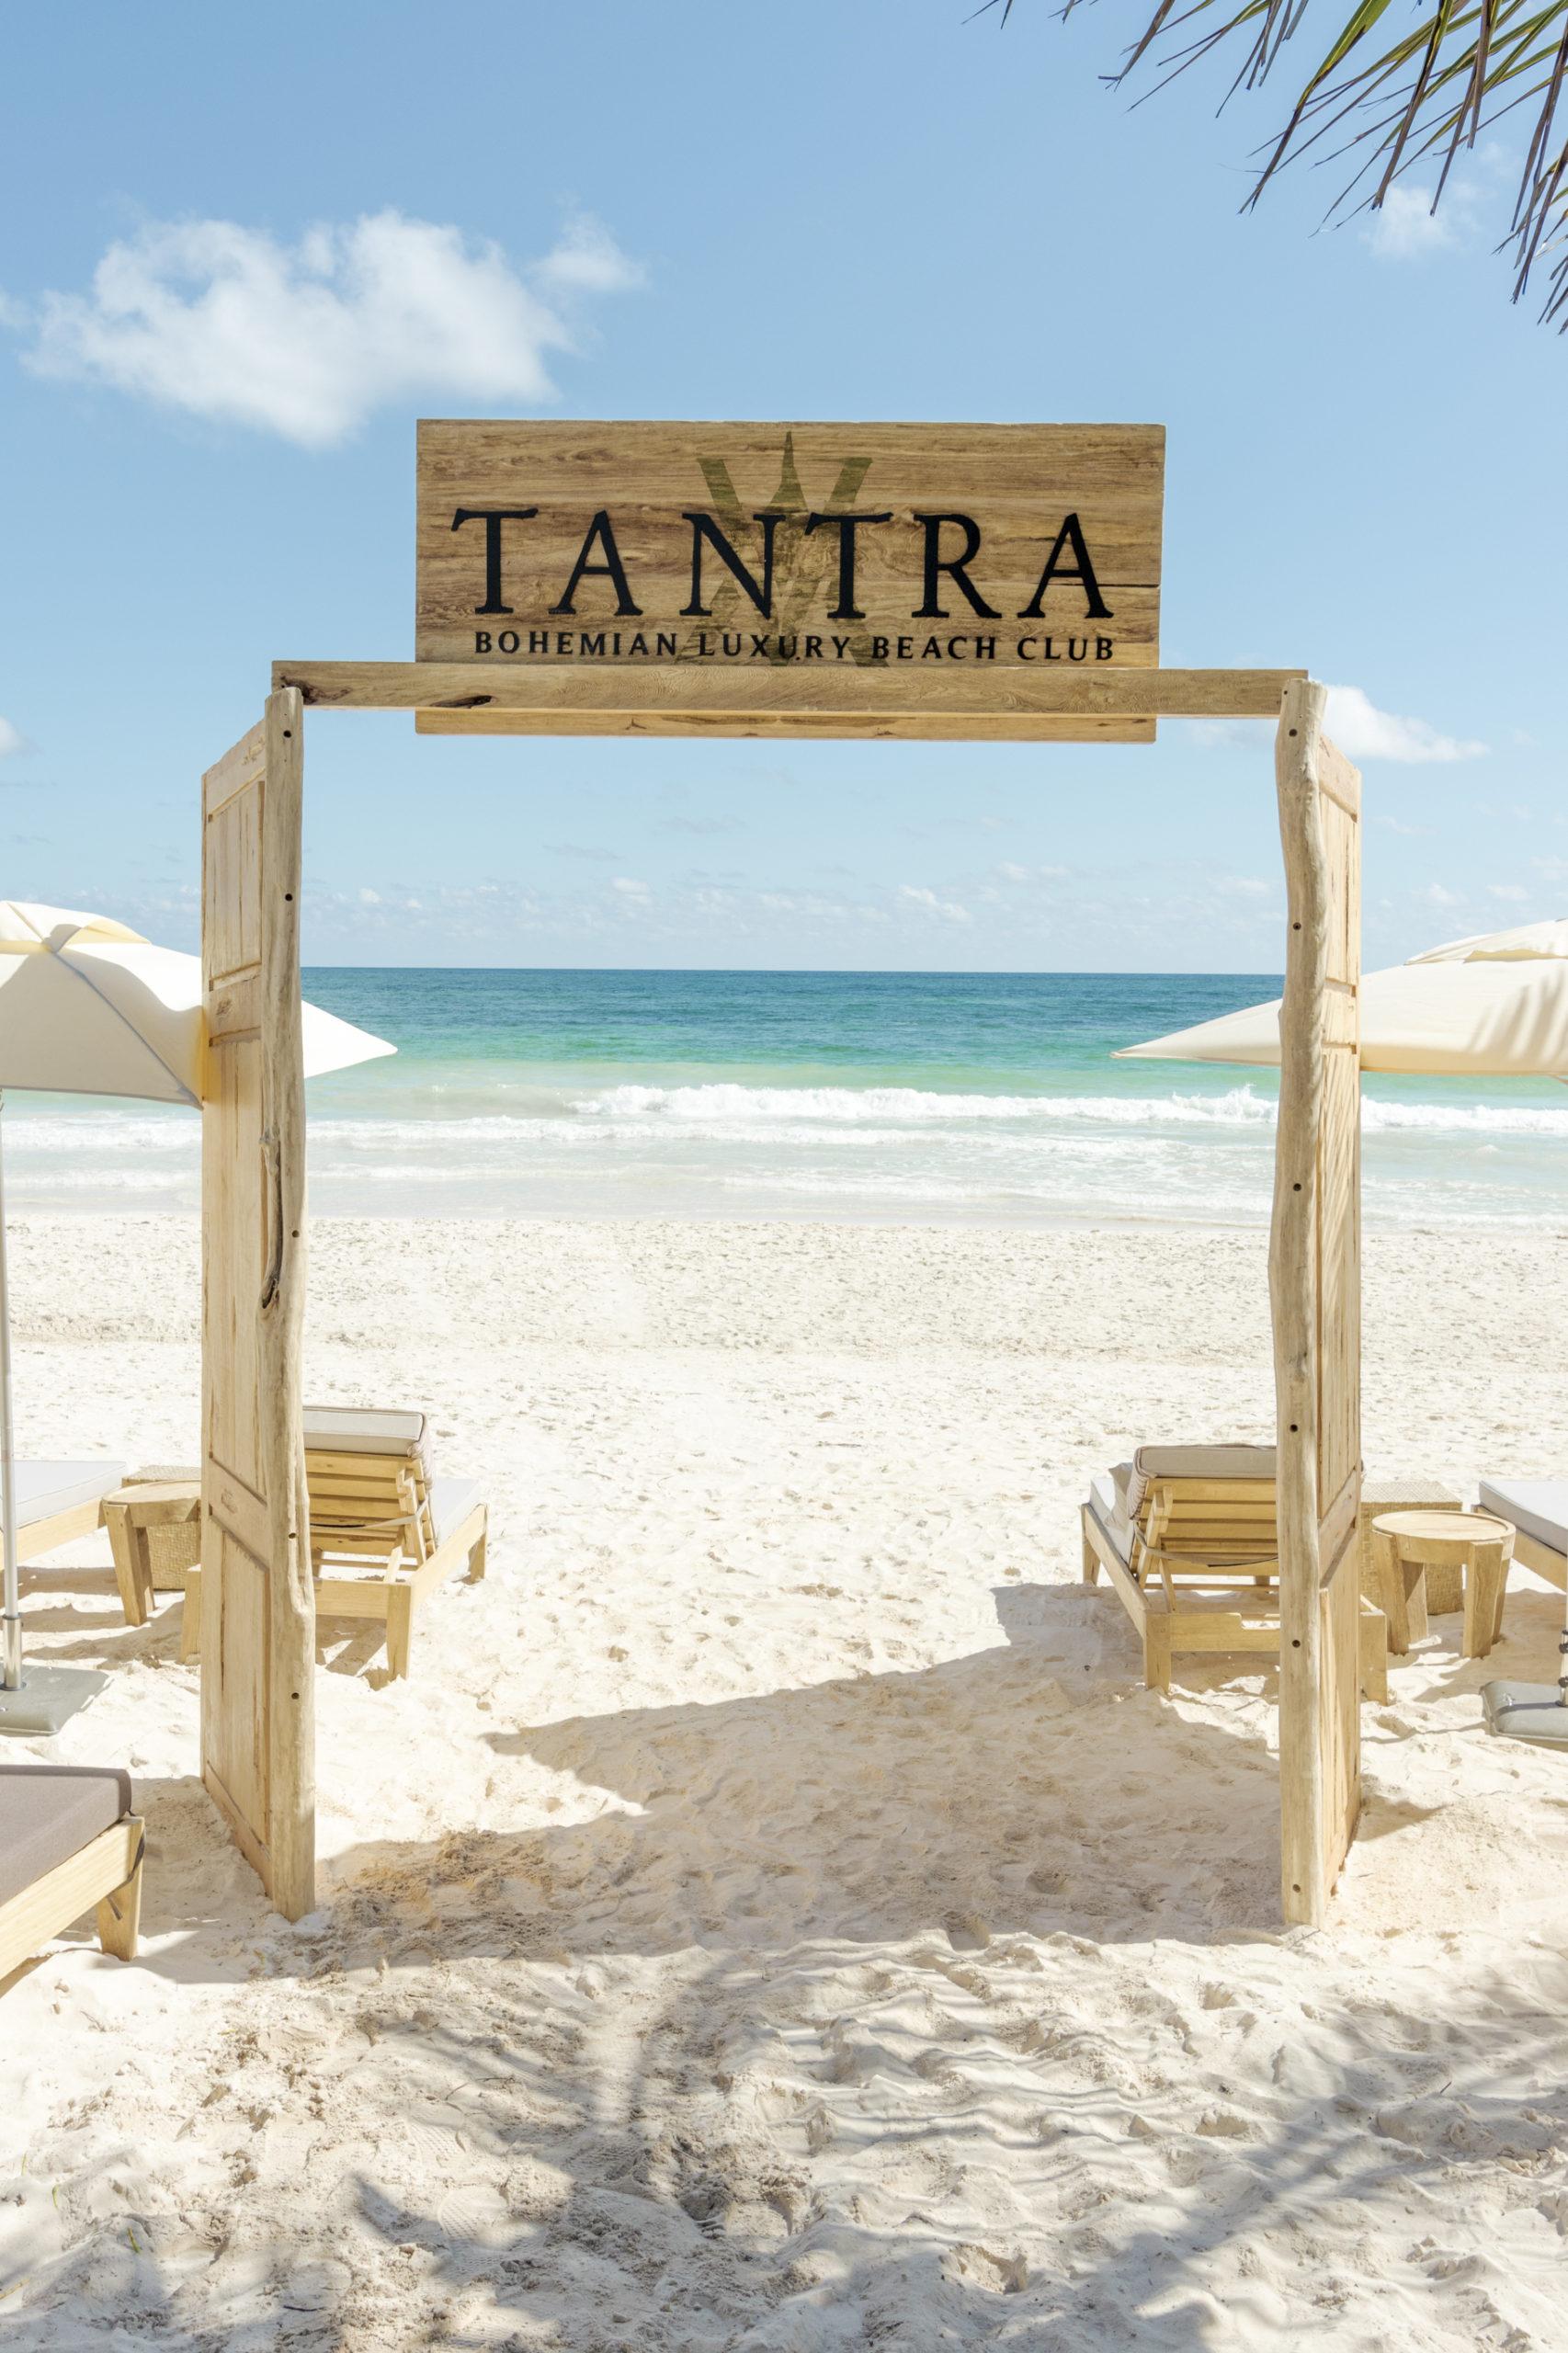 Tantra bohemian luxury beach club tulum: audaz, bohemio y sofisticado